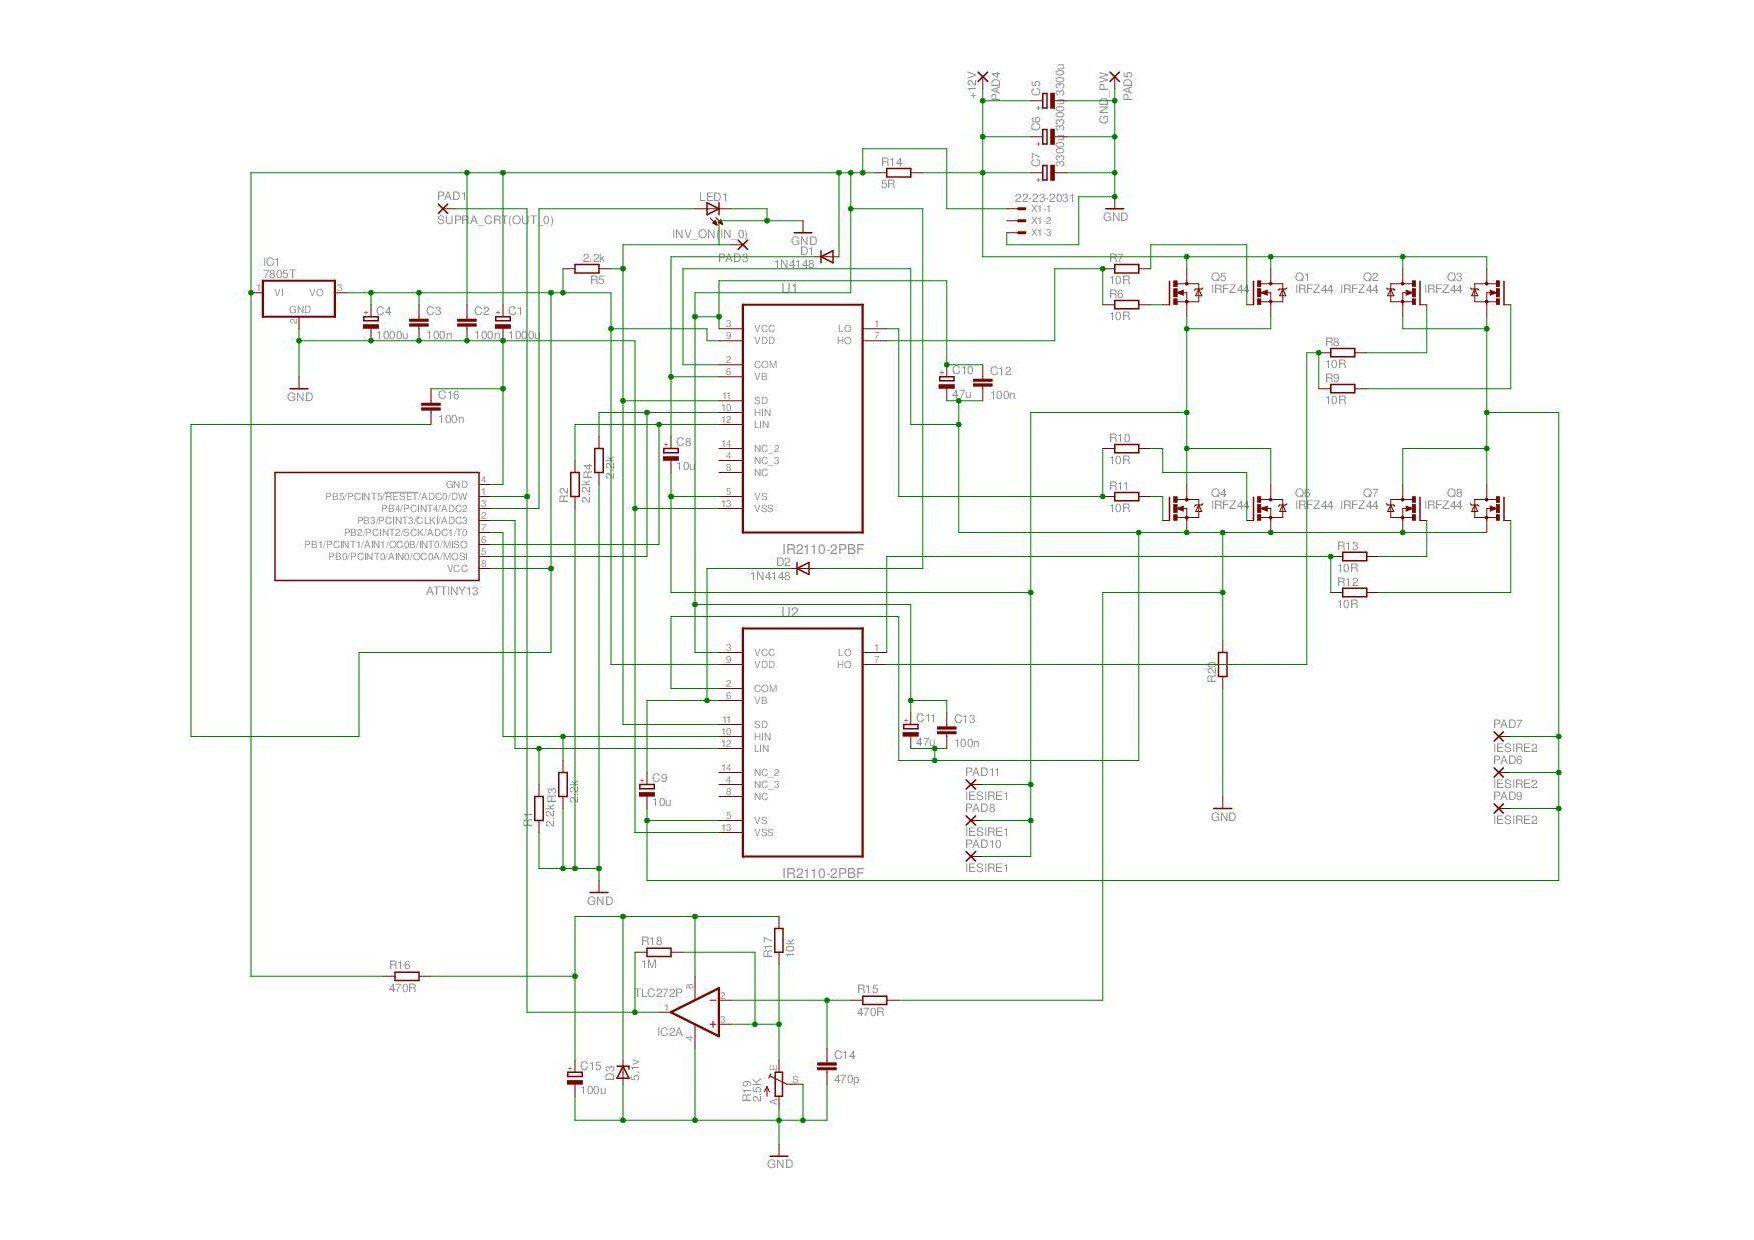 Pure Sine Inverter Schematic Sne Invertor Pinterest Wave Generator Circuit Diagram